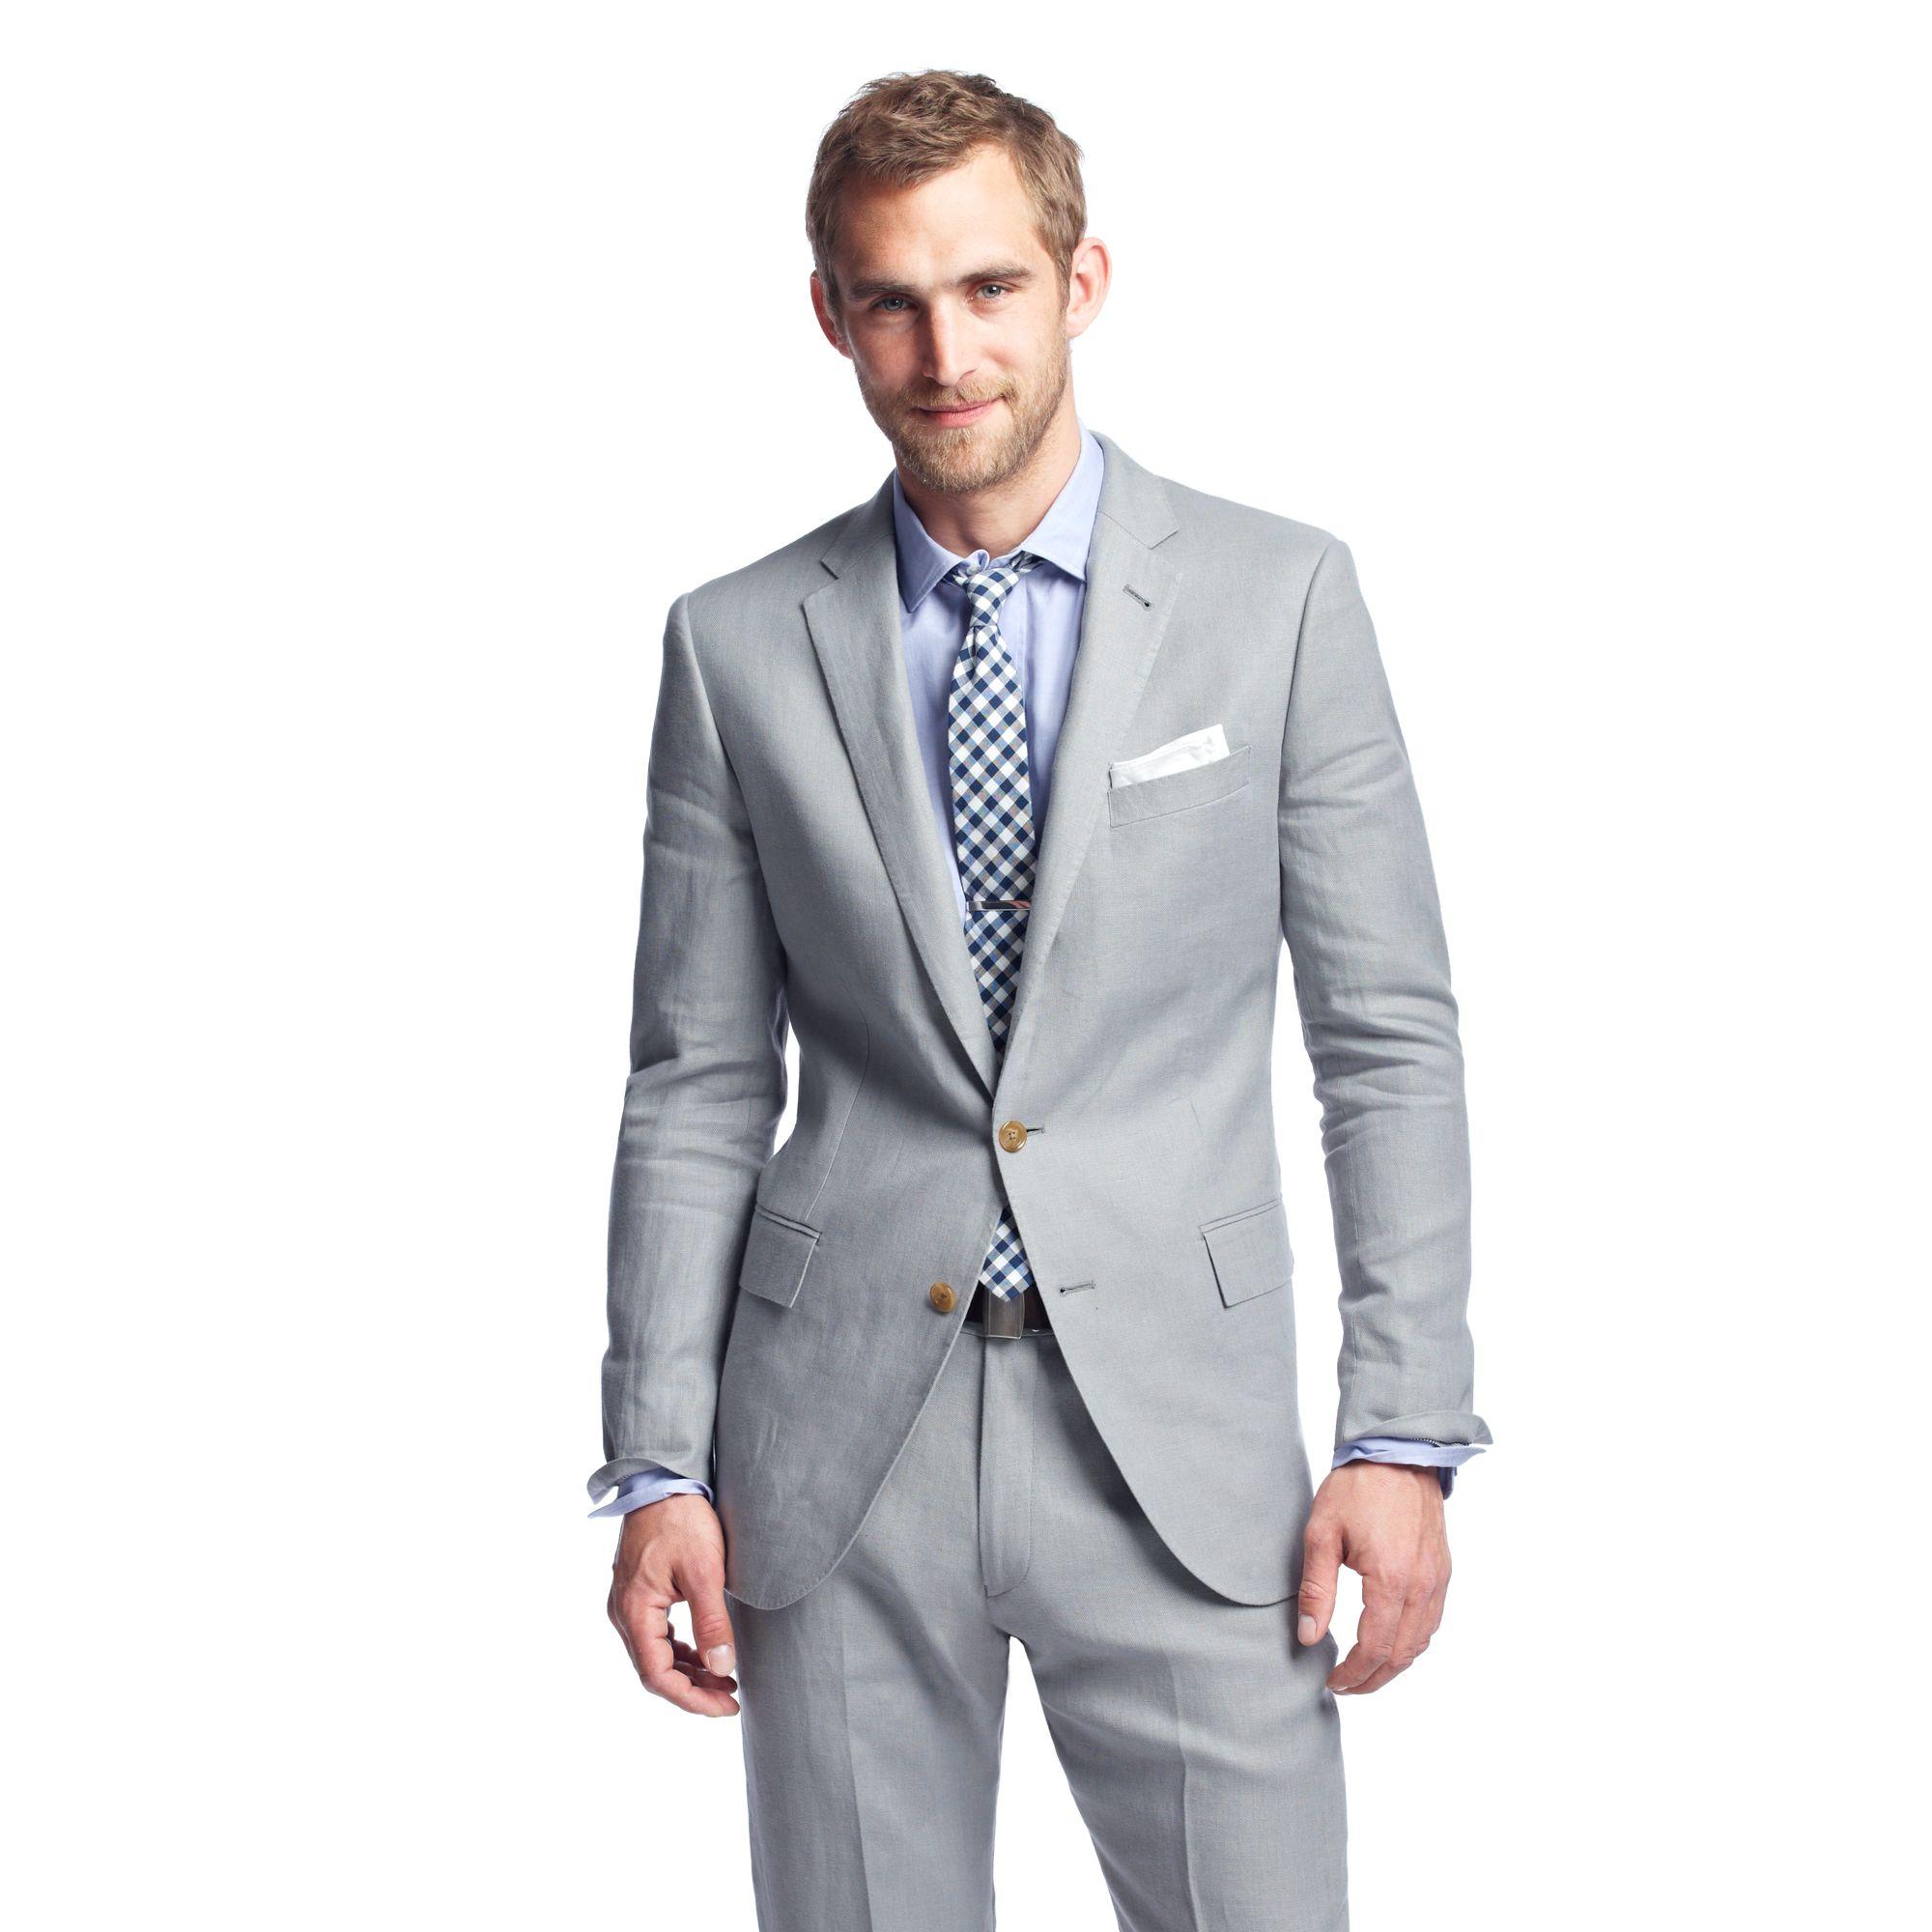 J Crew Ludlow Classic Suit Pant In Irish Linen In Gray For